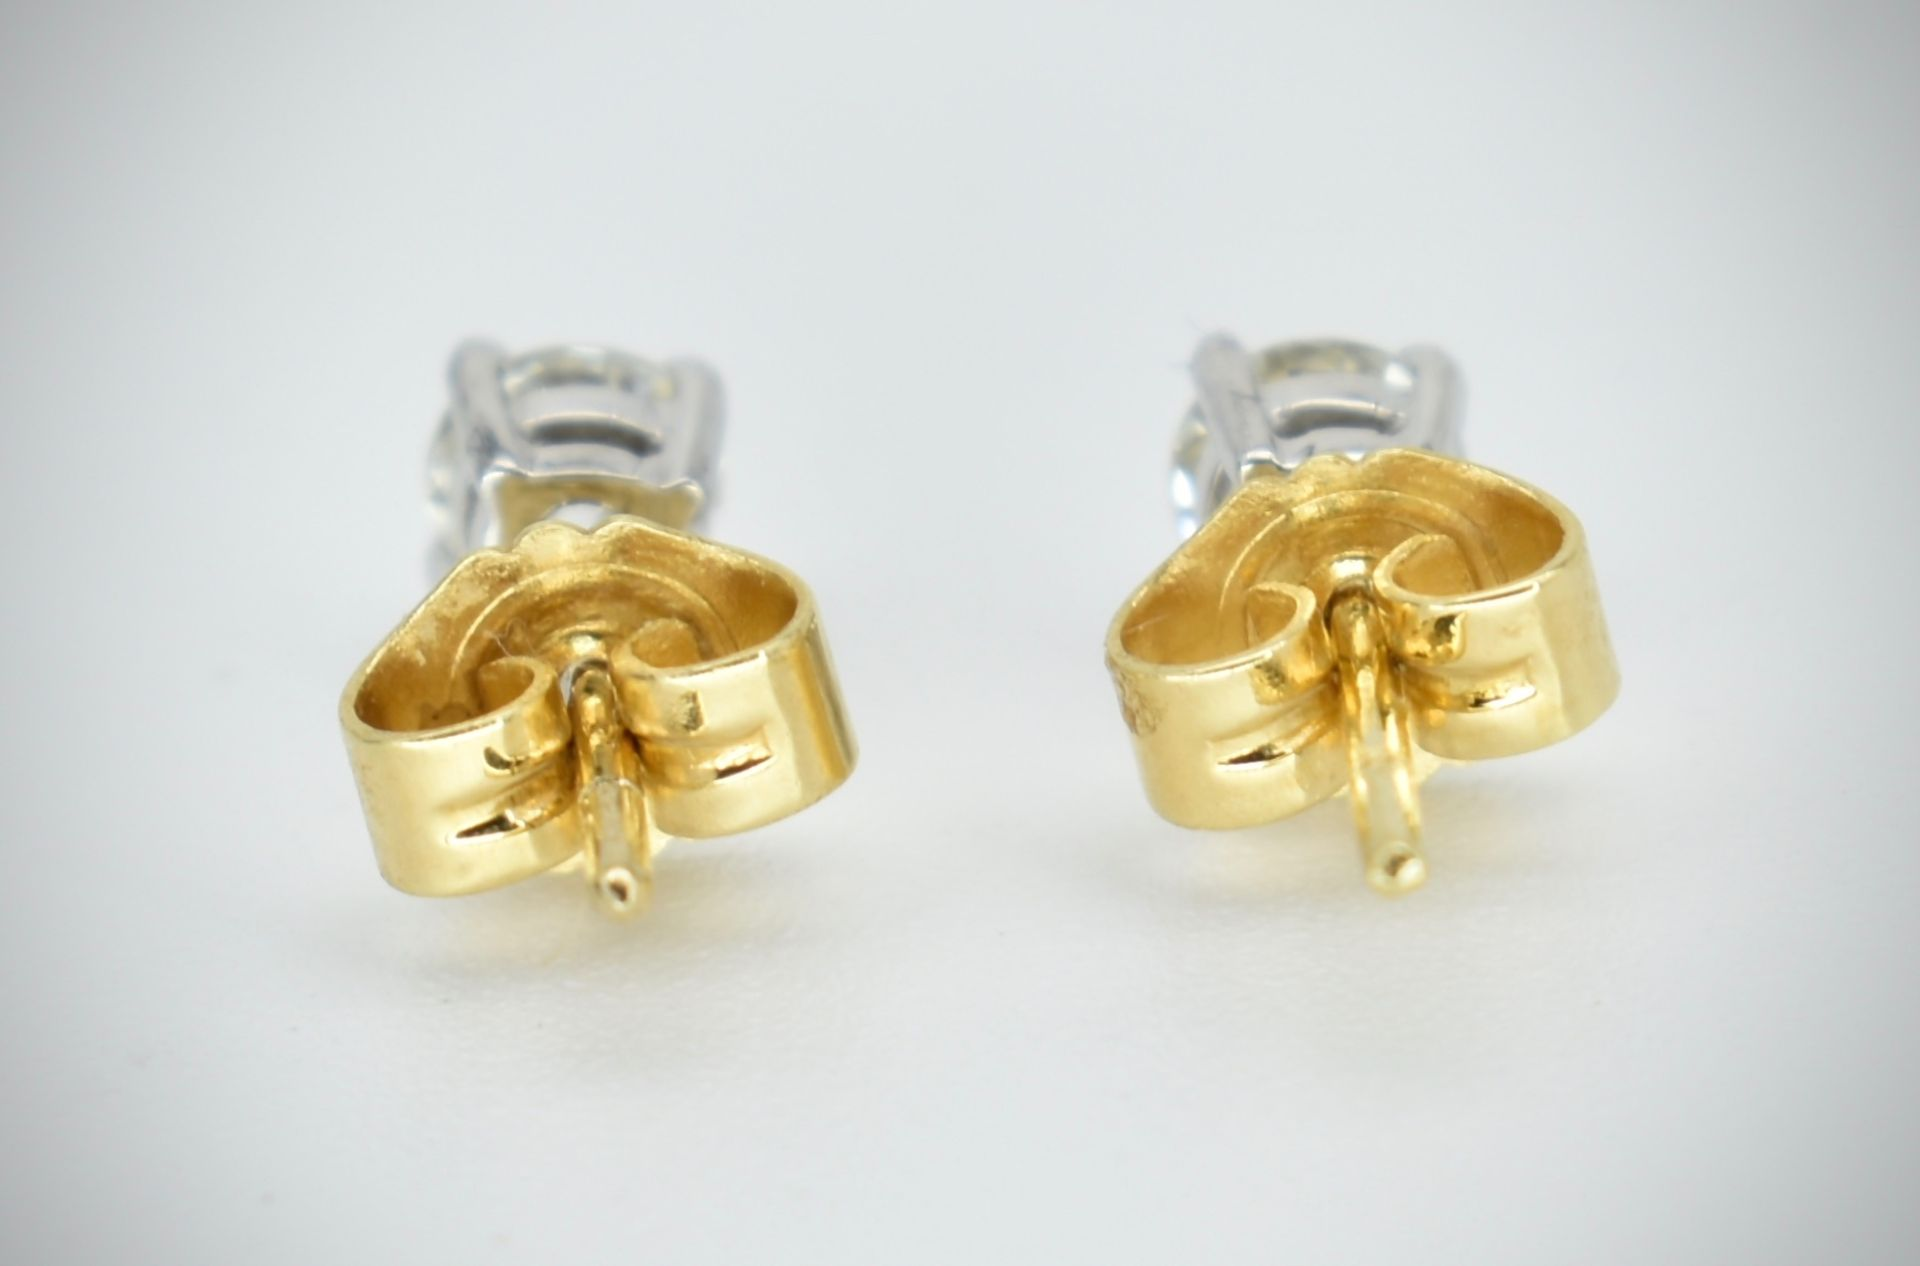 Pair of 18ct Gold & Diamond Stud Earrings - Image 2 of 2